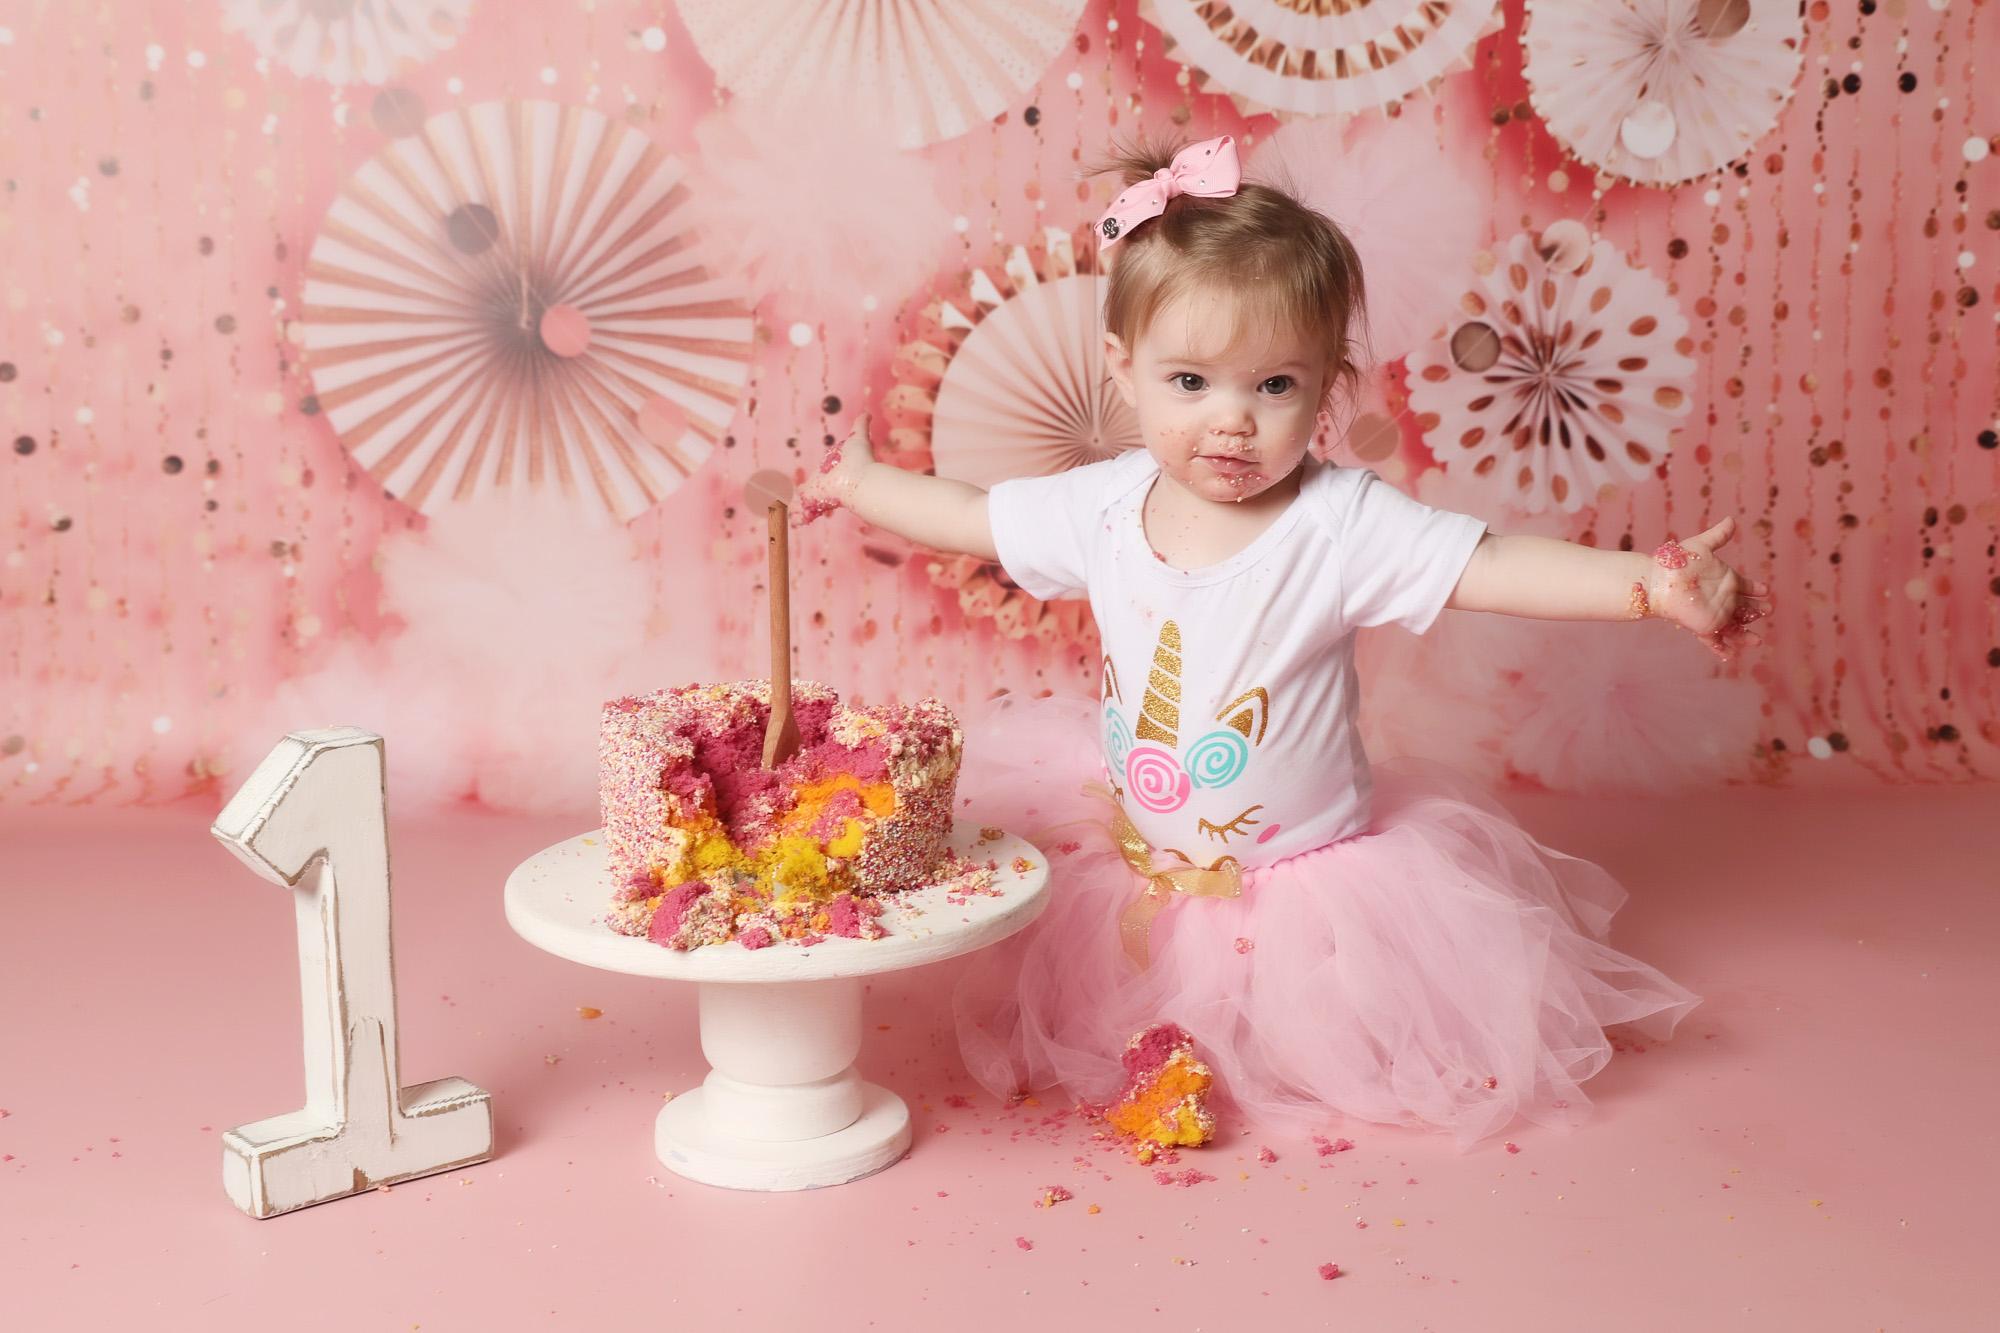 little girl cake smash first birthday photoshoot